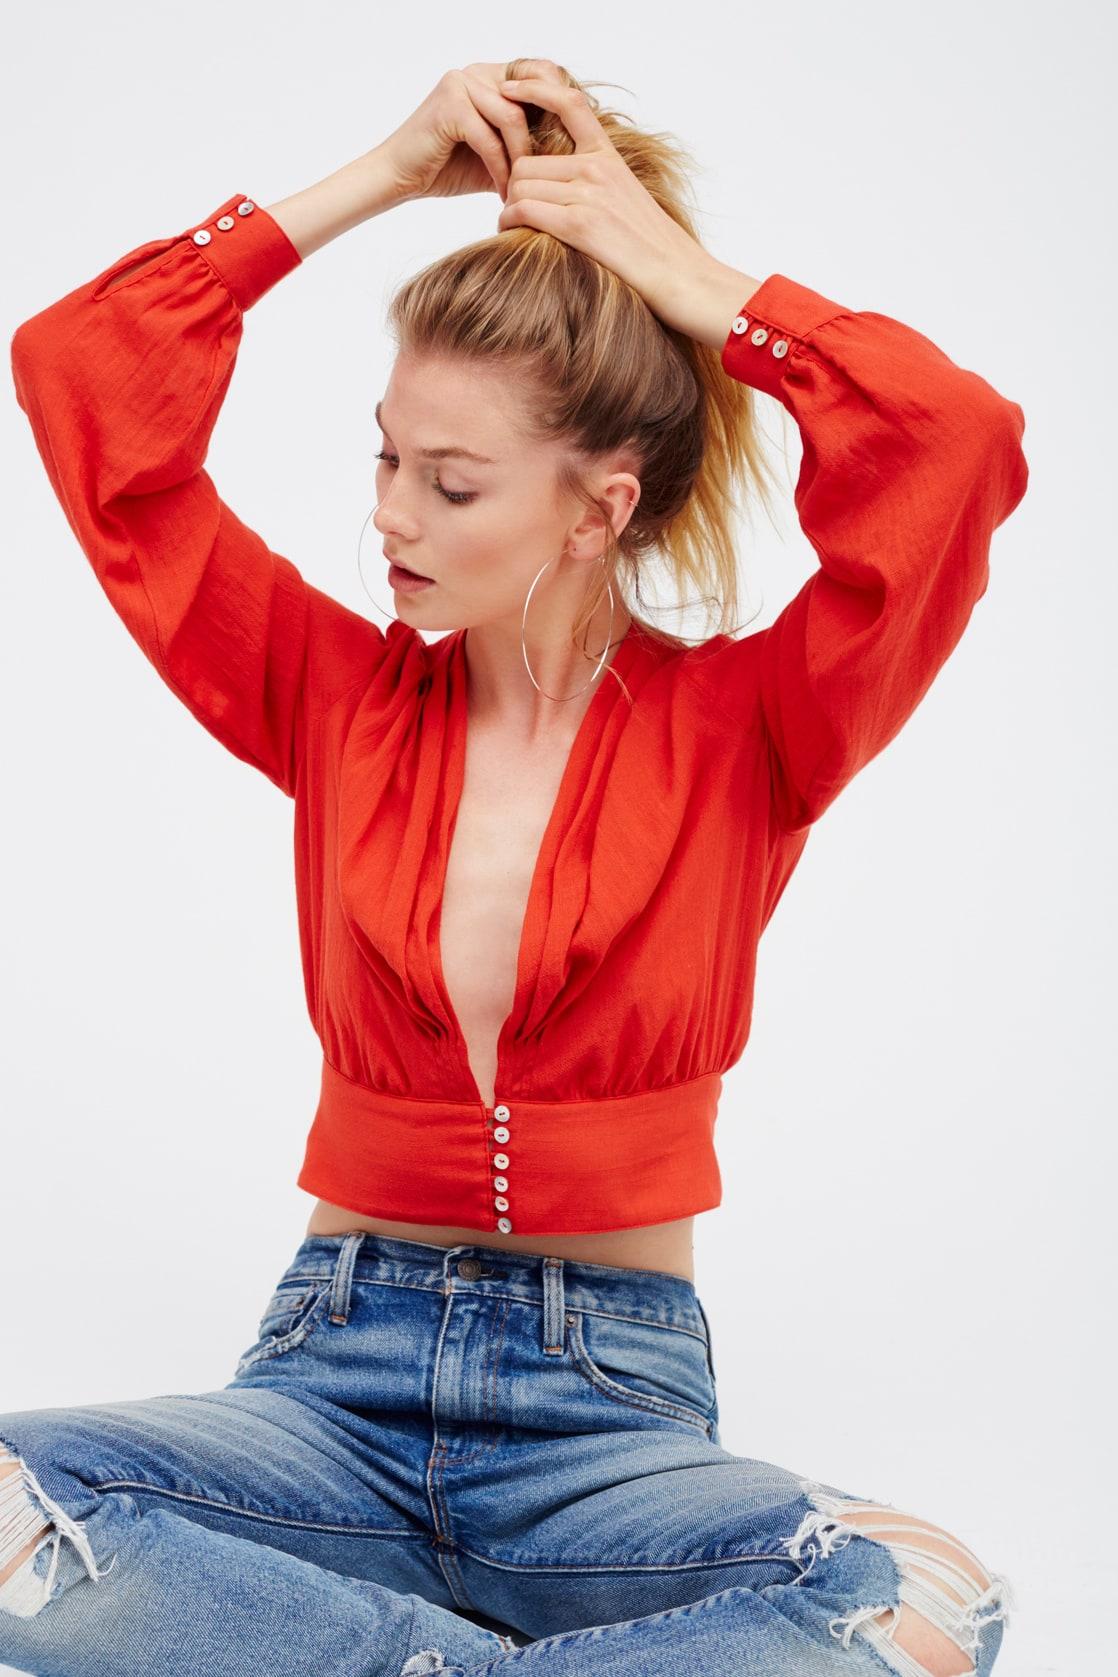 ICloud Sigrun Eva Jonsdottir nude (63 photos), Sexy, Leaked, Boobs, in bikini 2019